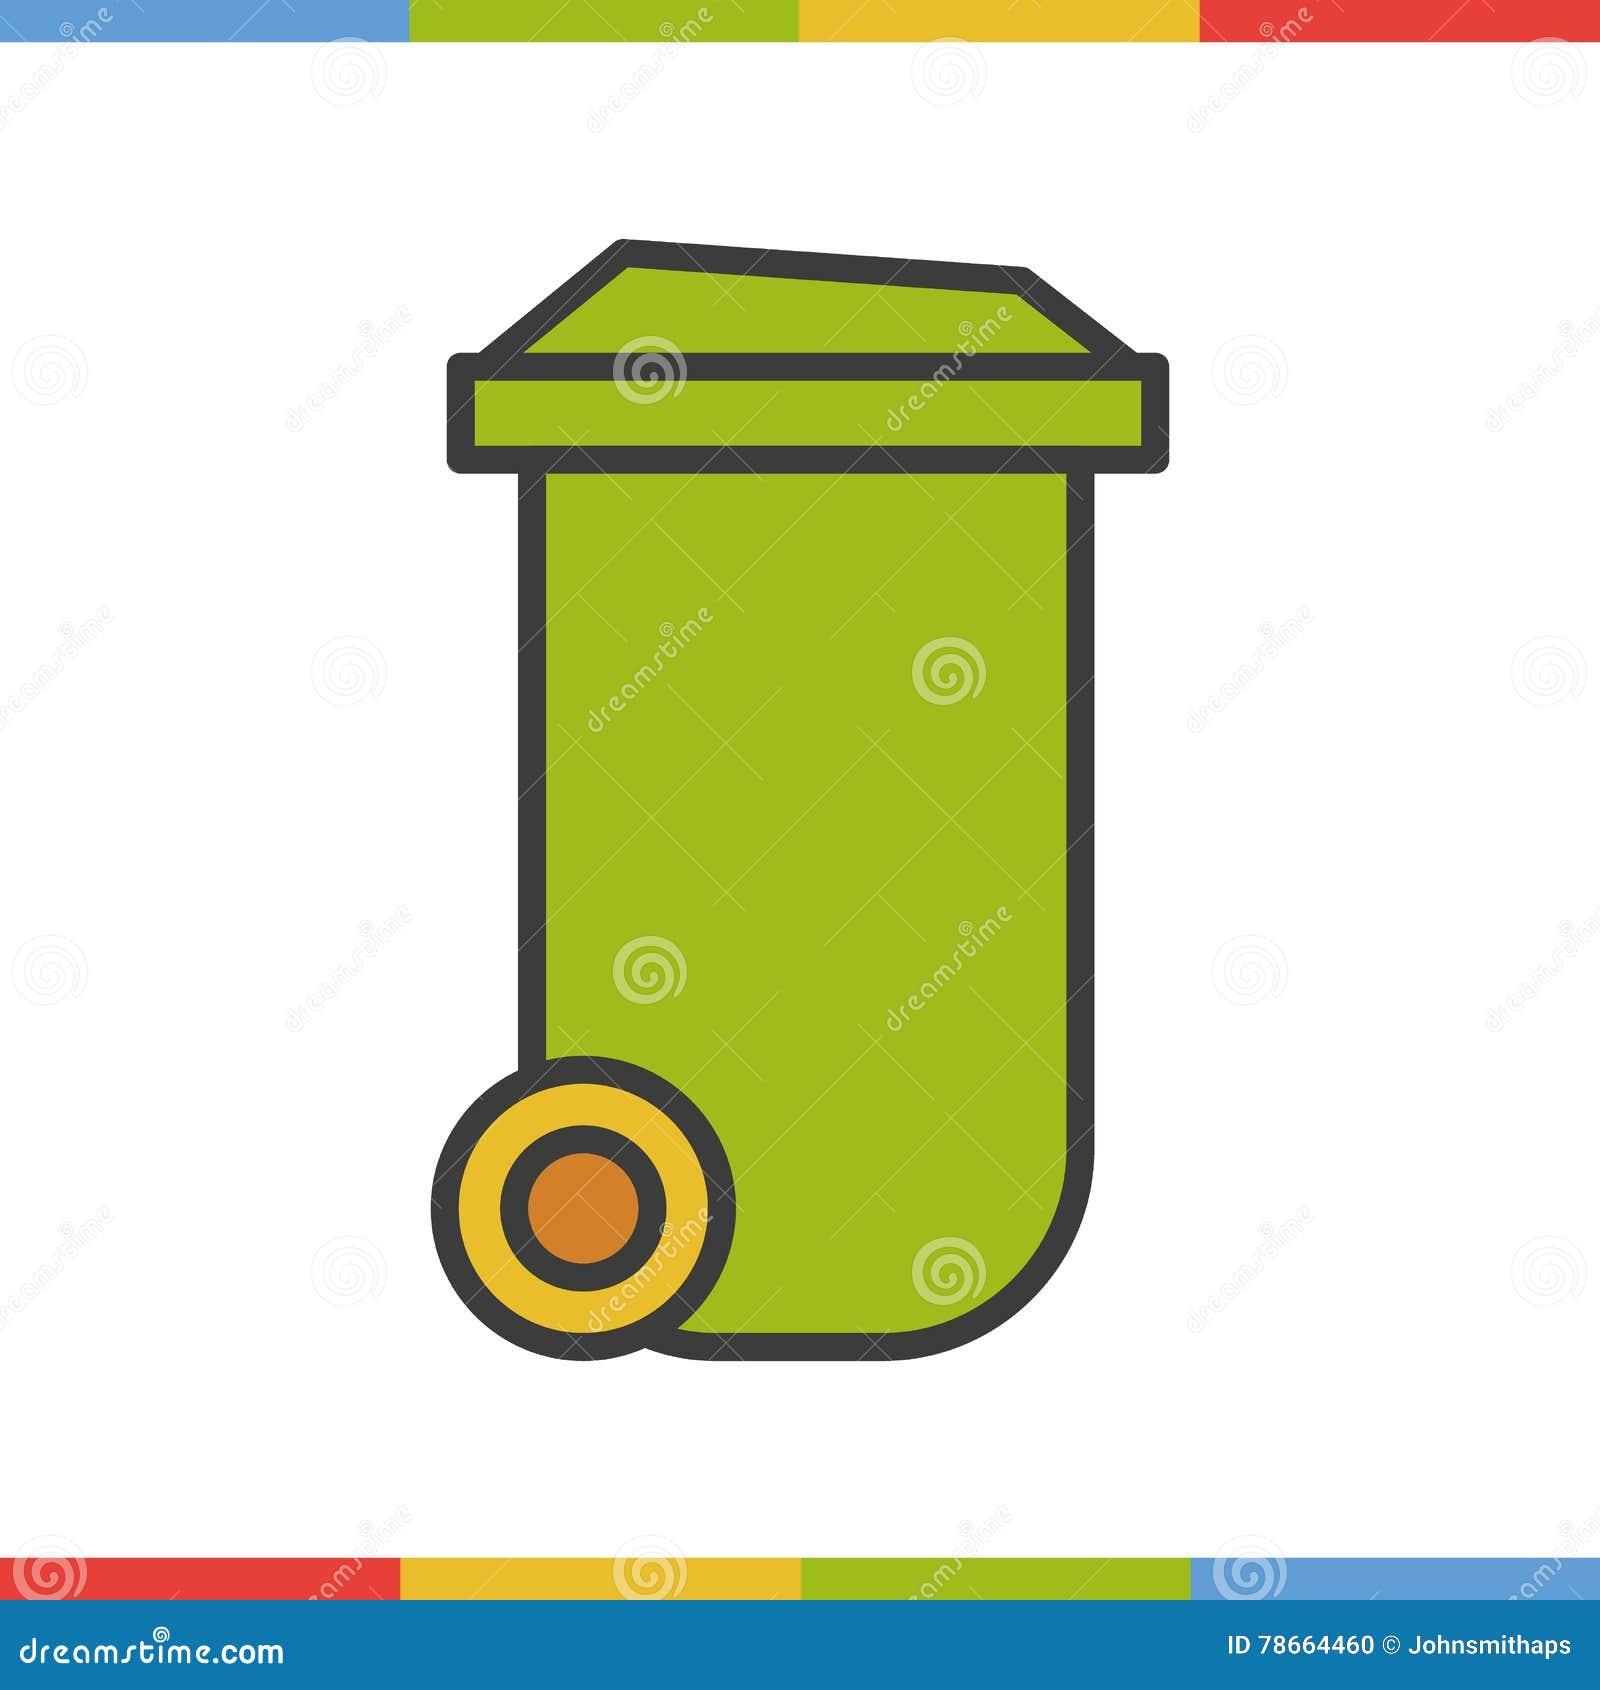 Trash can color icon.